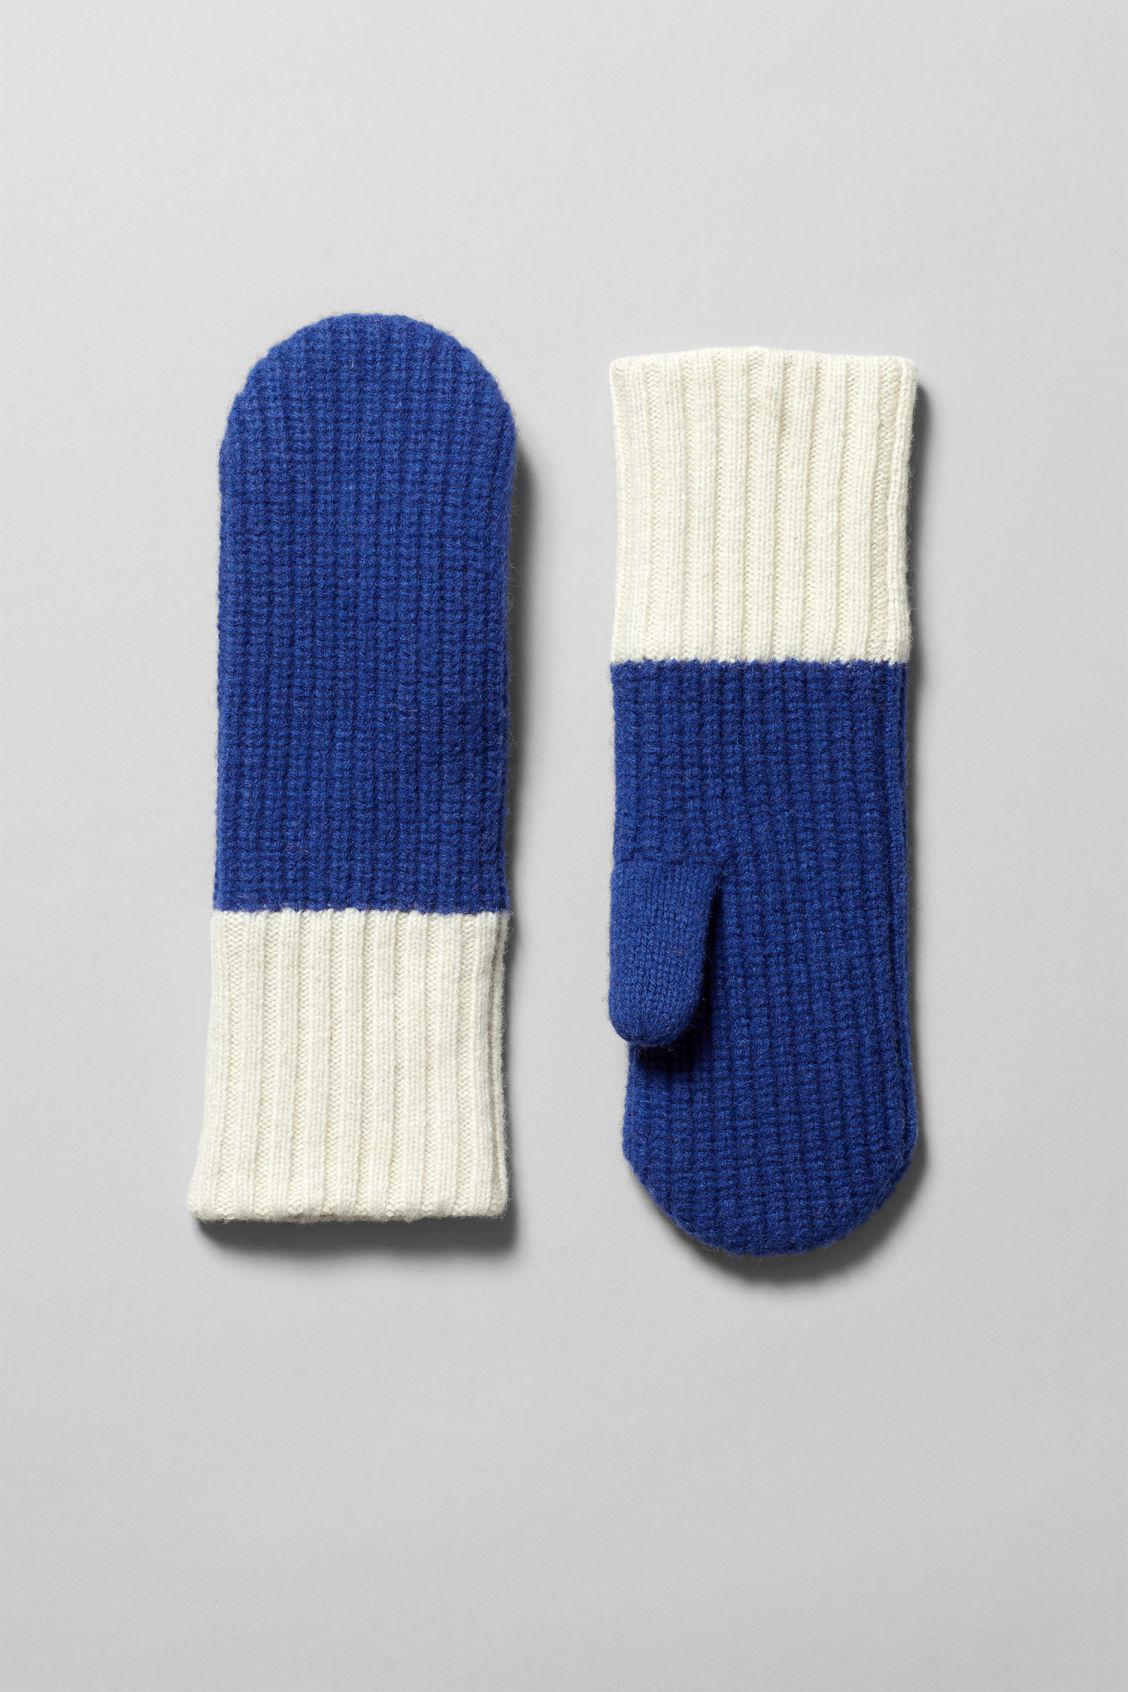 Saipal Knit Mittens - Blue - Accessories - Weekday